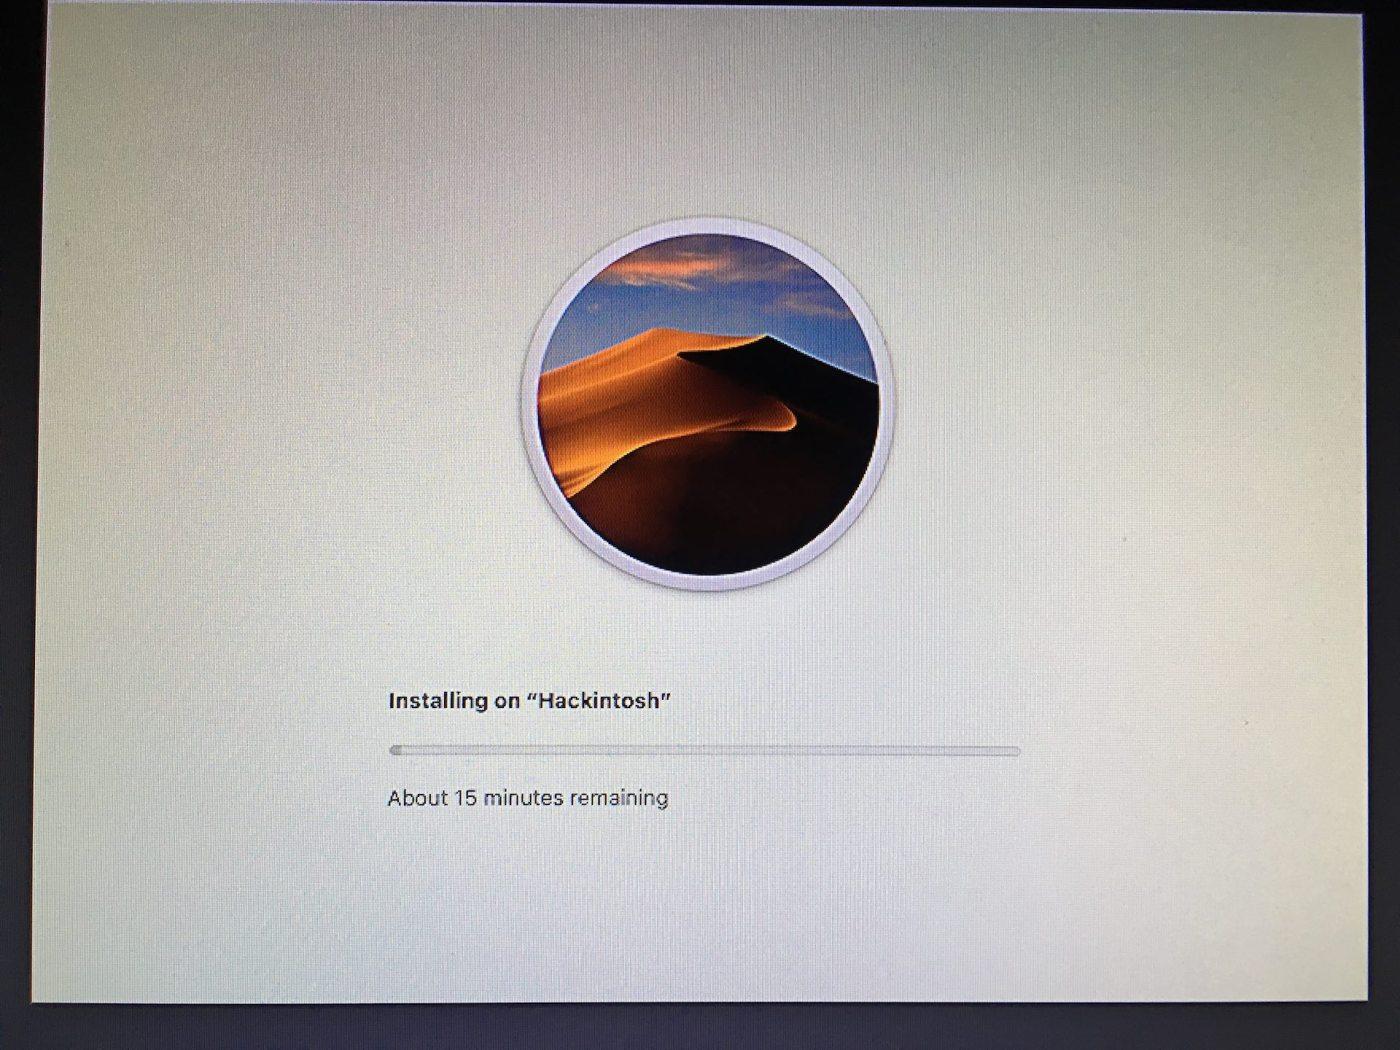 Install macOS Mojave on Hackintosh